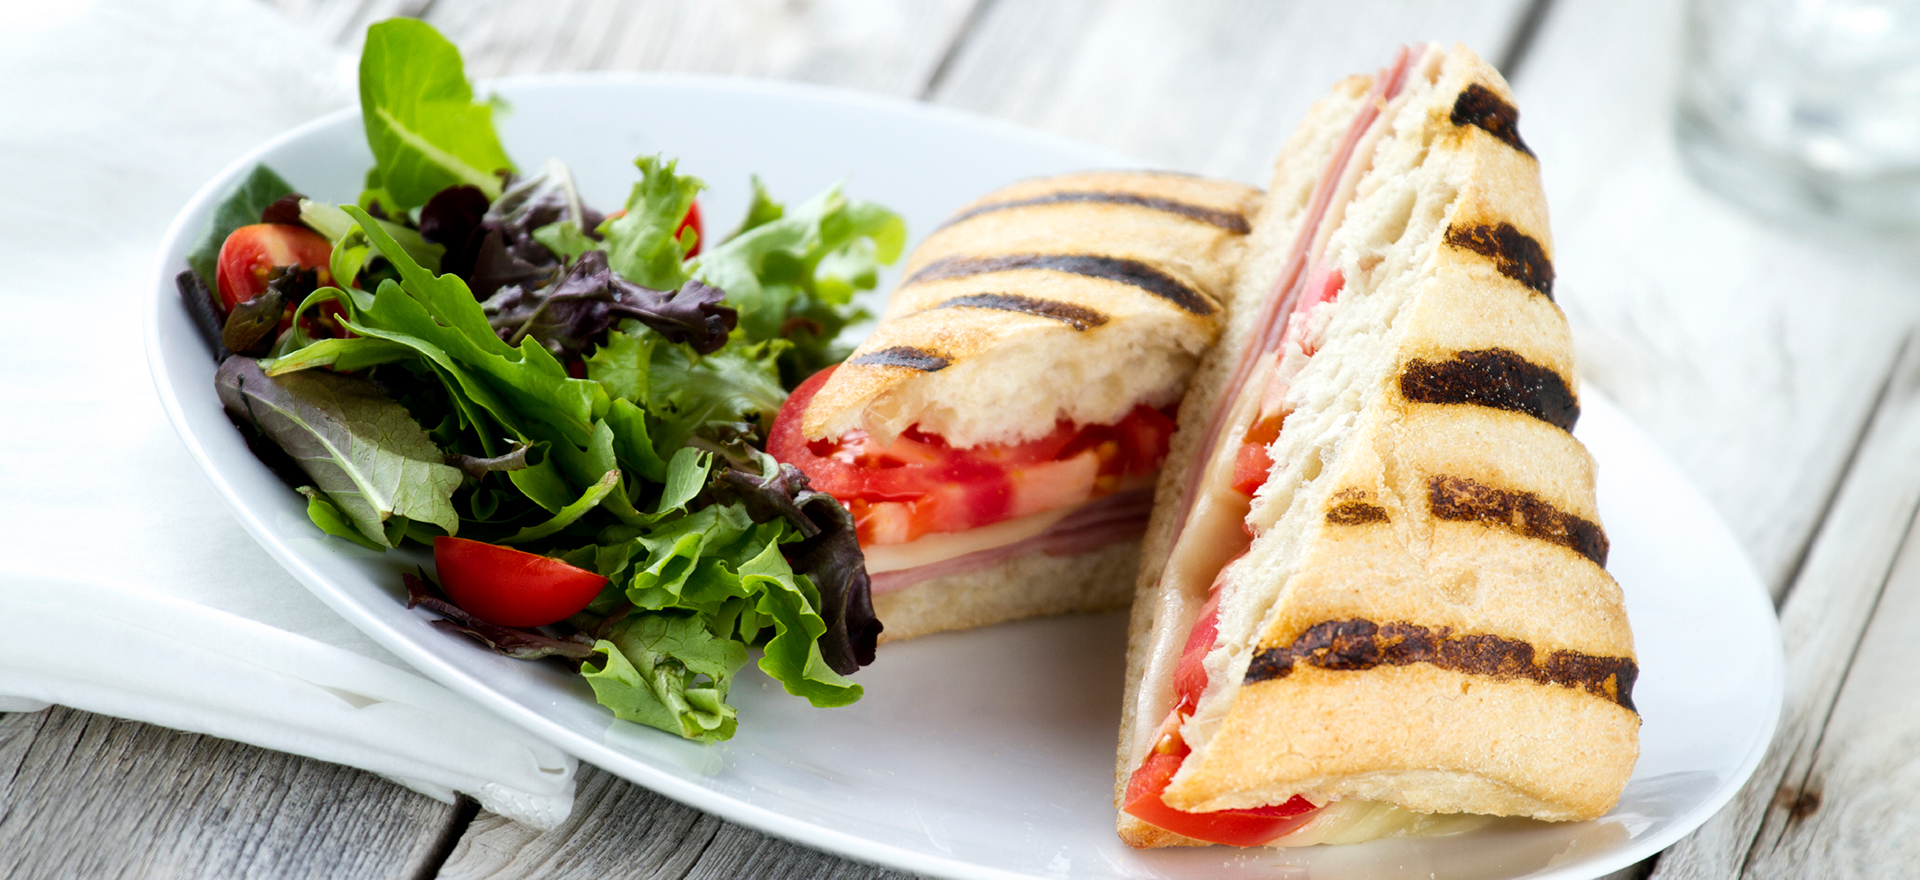 2-sandwich